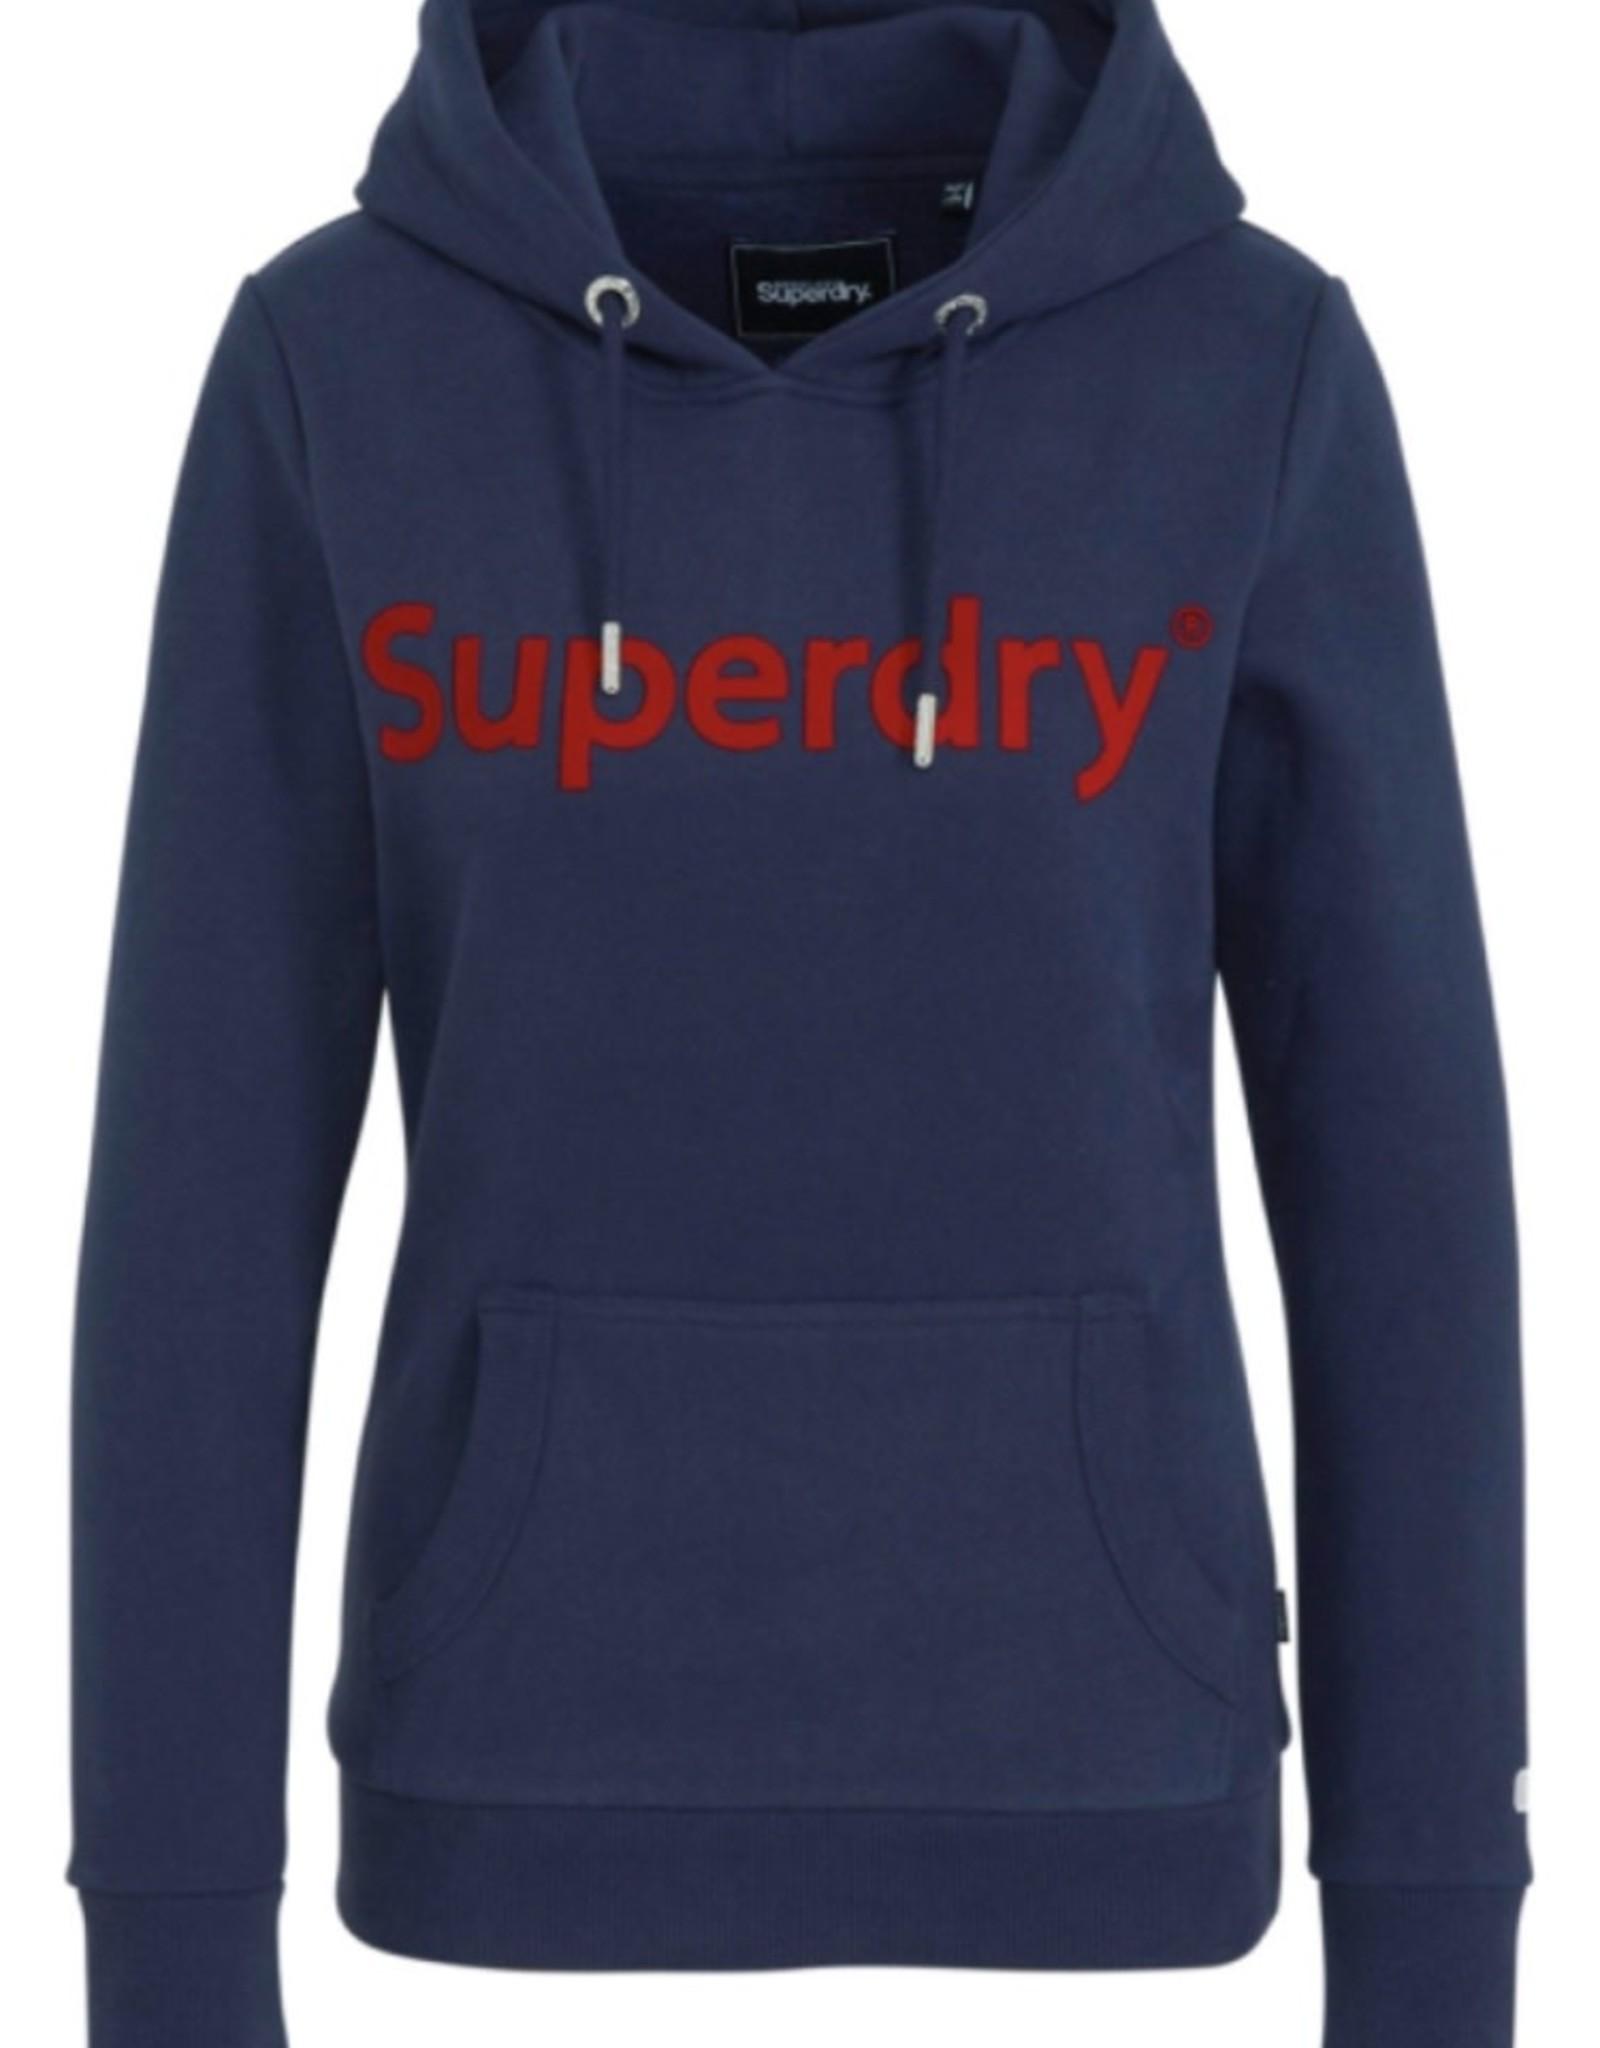 Superdry SD FLOCK HOOD GKV